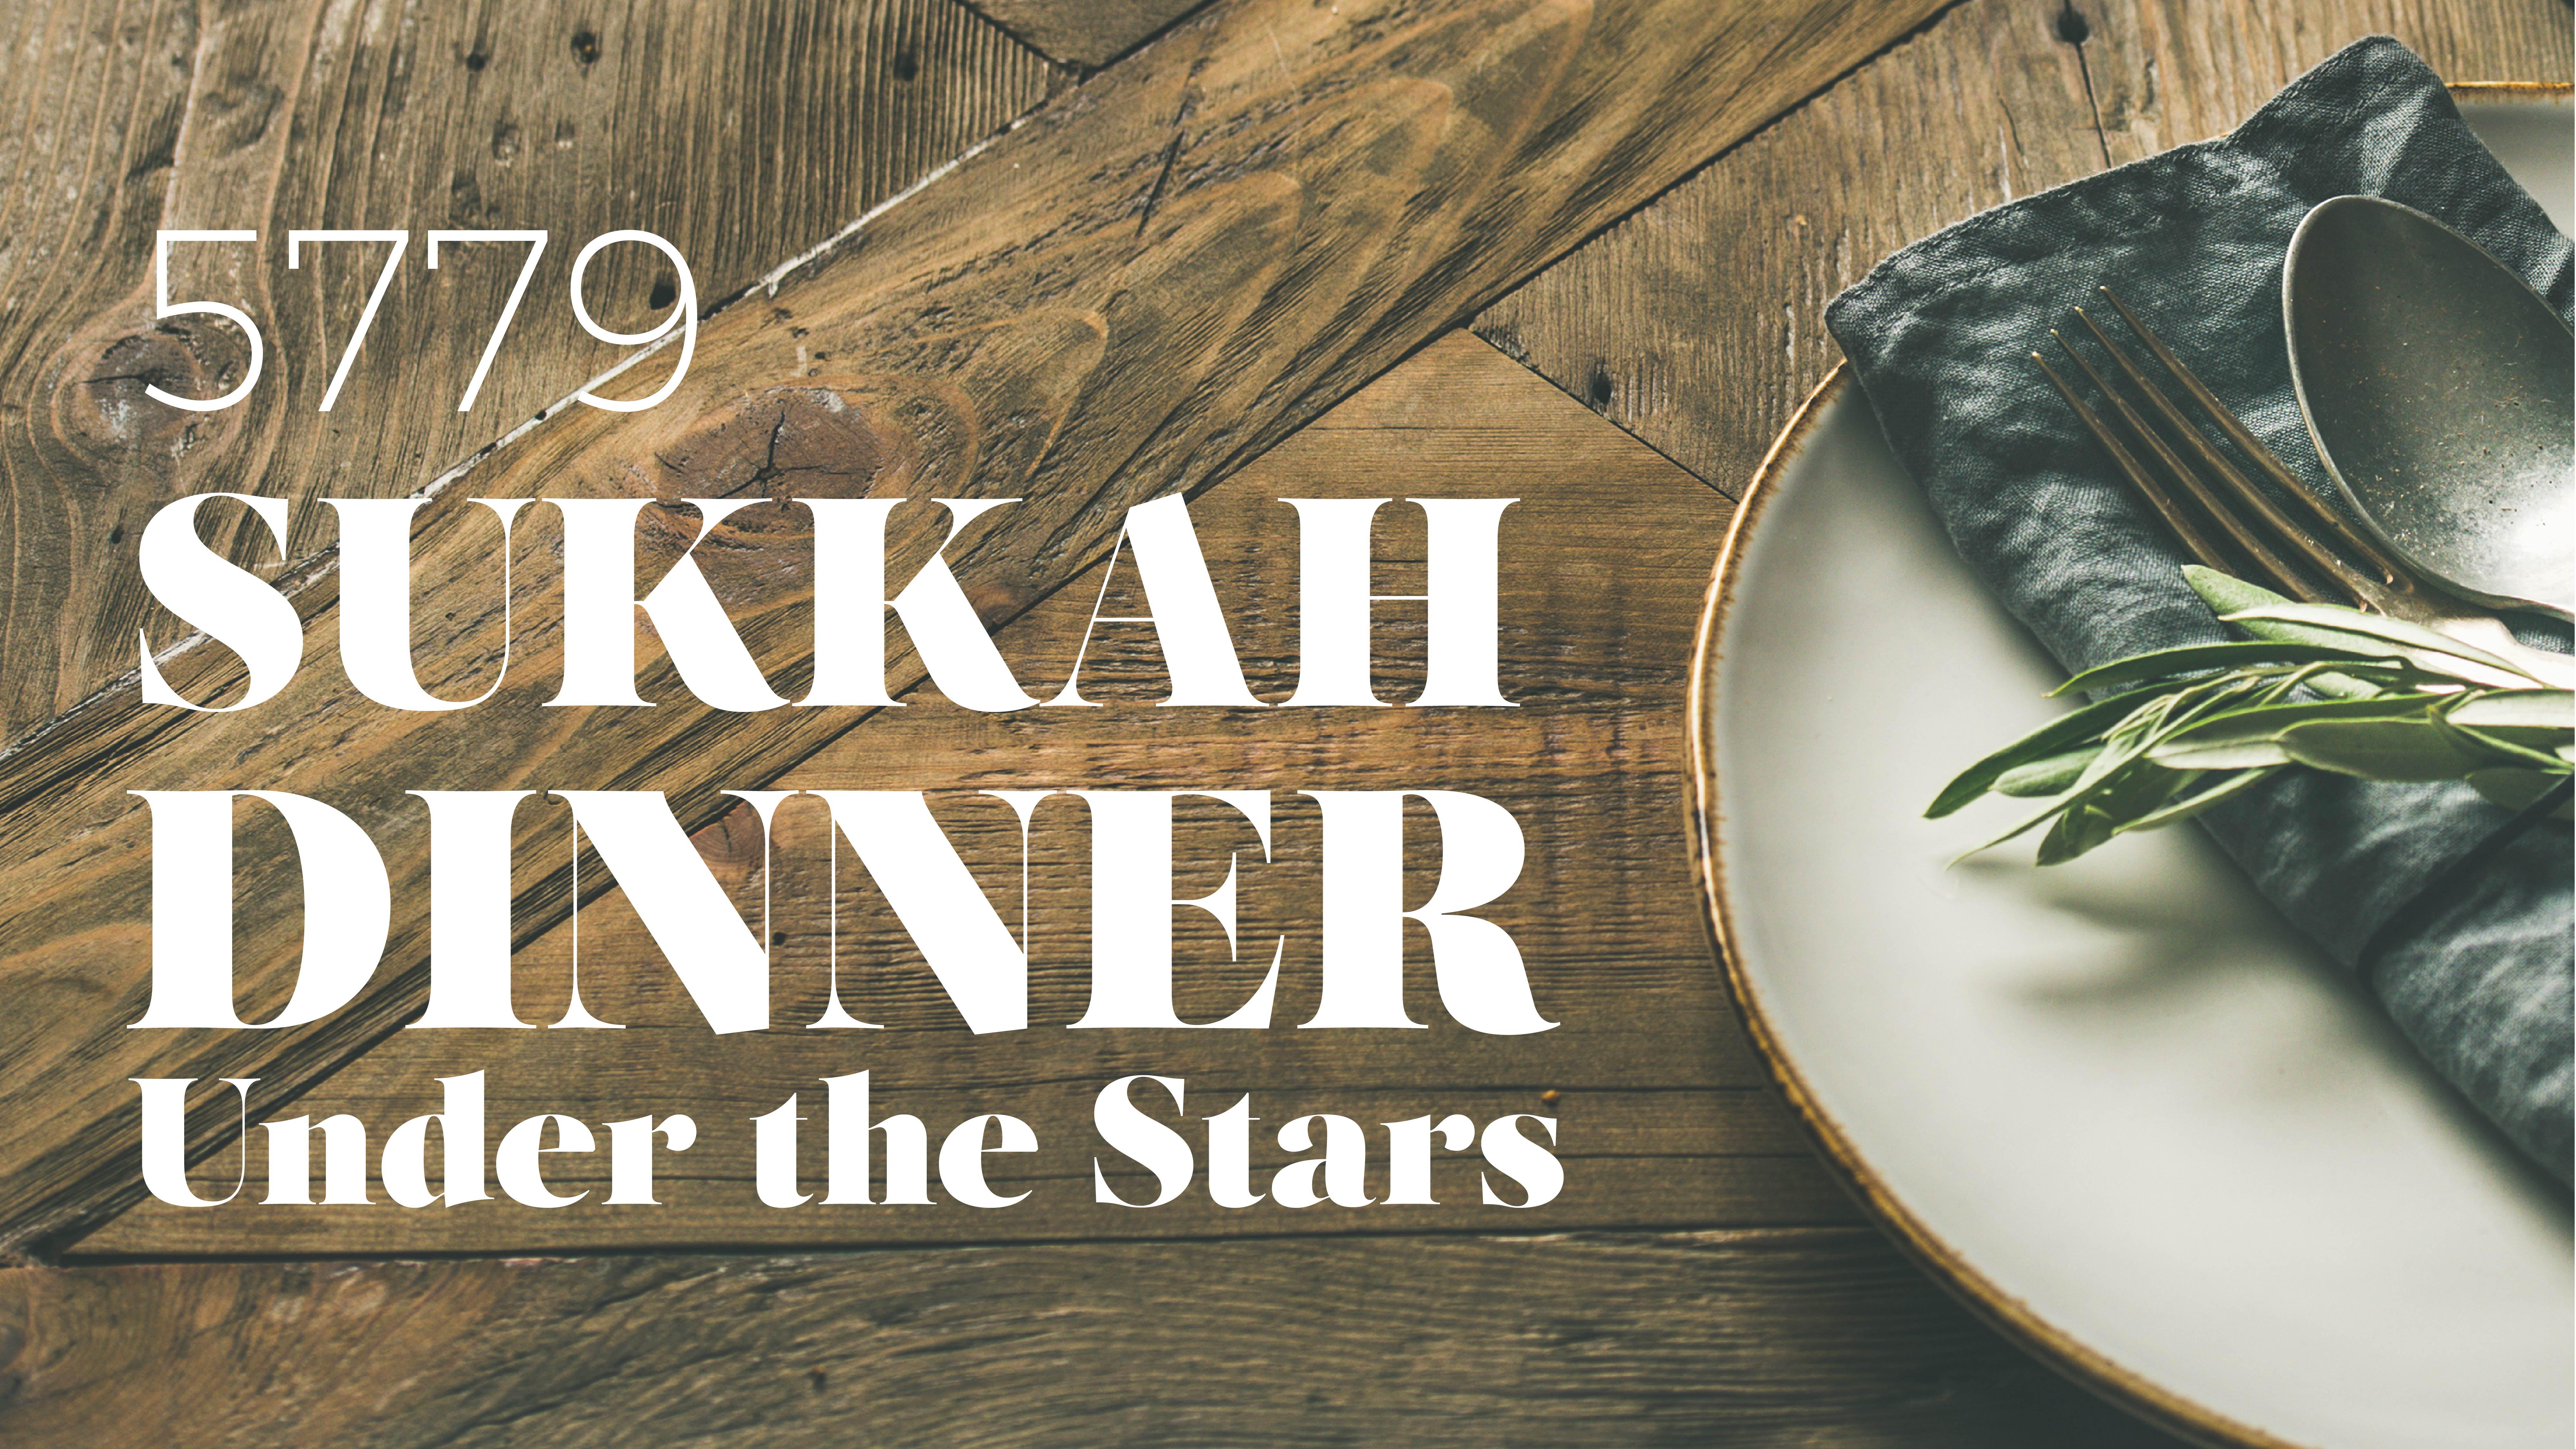 Sukkah Dinner Under the Stars - Congregation Kehilath Jeshurun